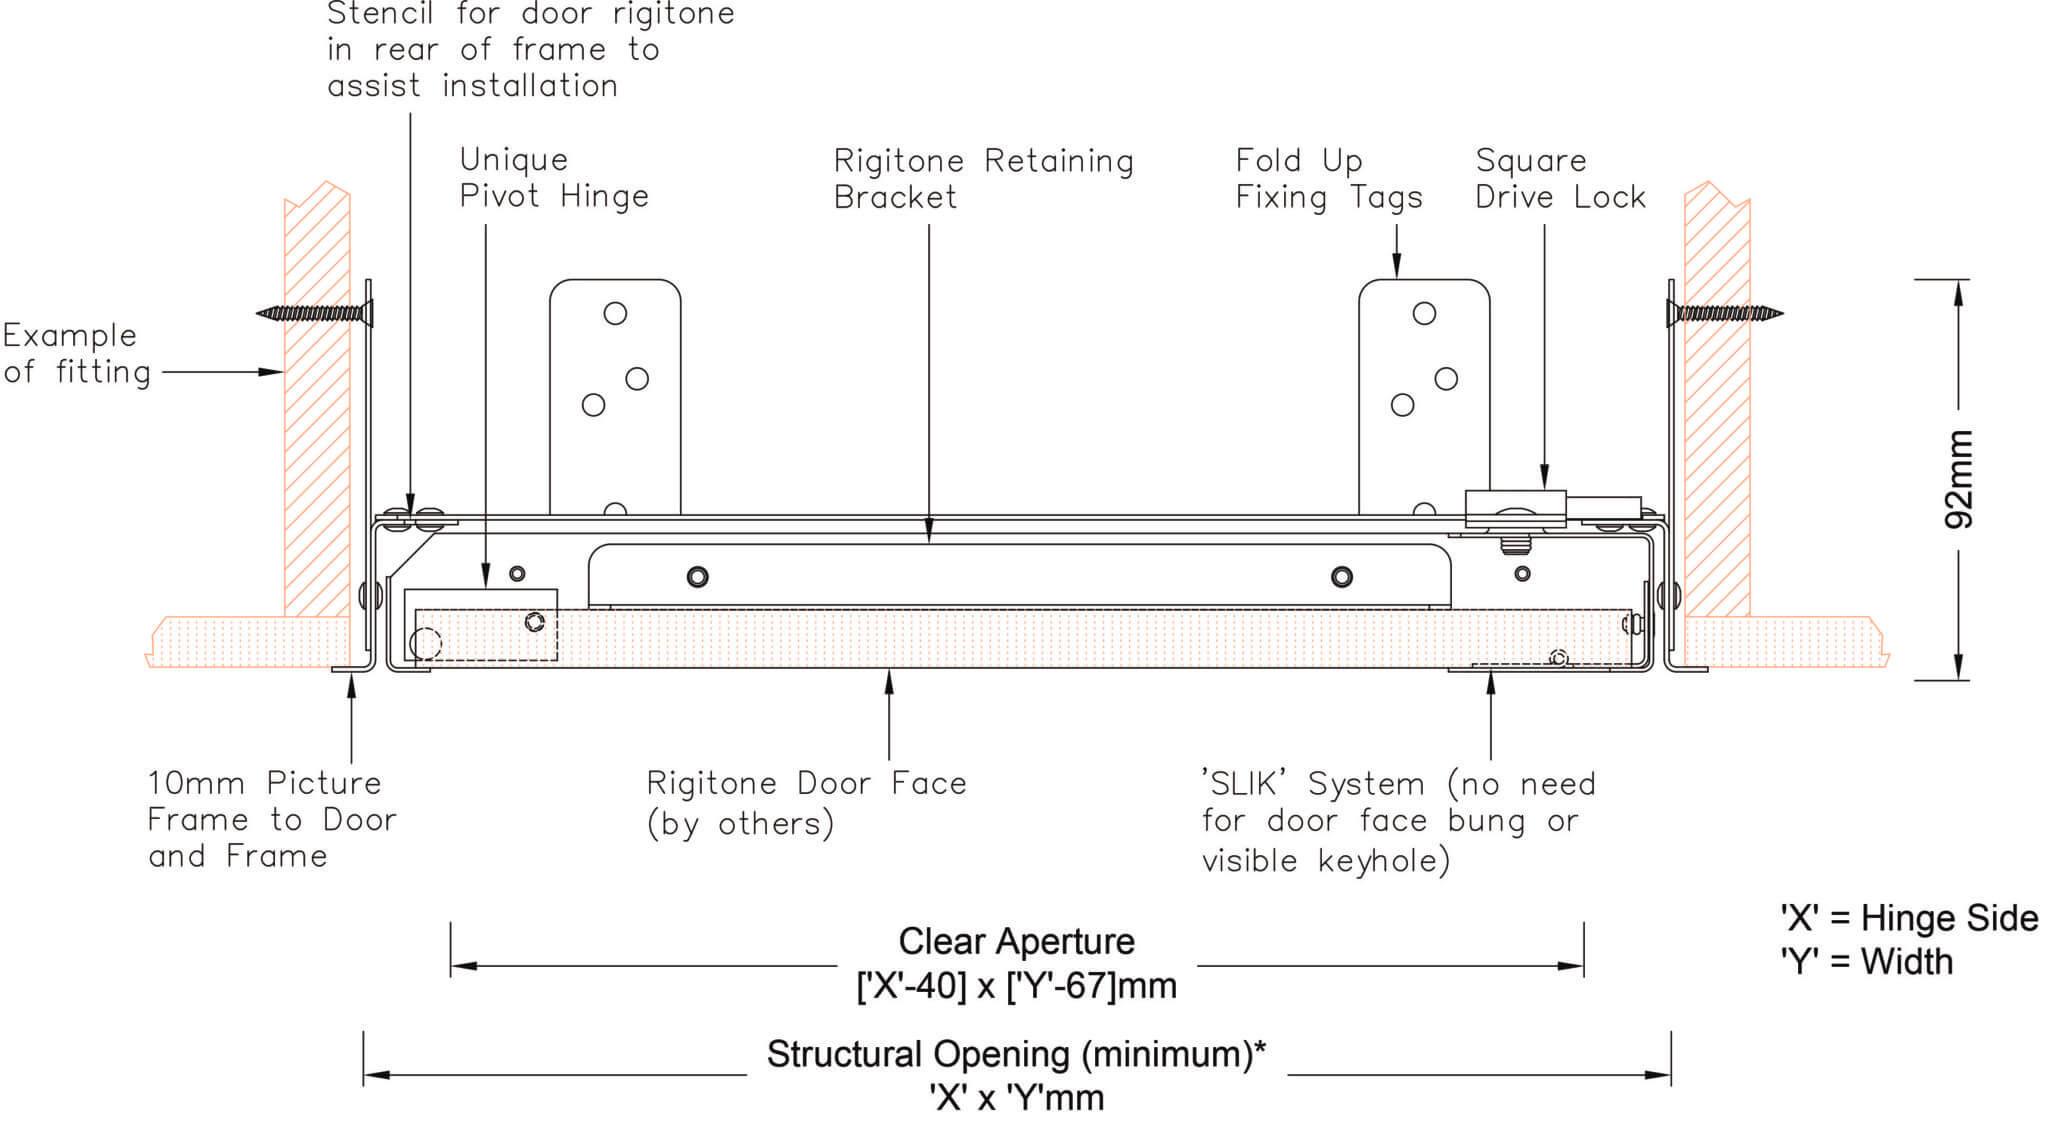 Rigitone-Access-Panel drawing